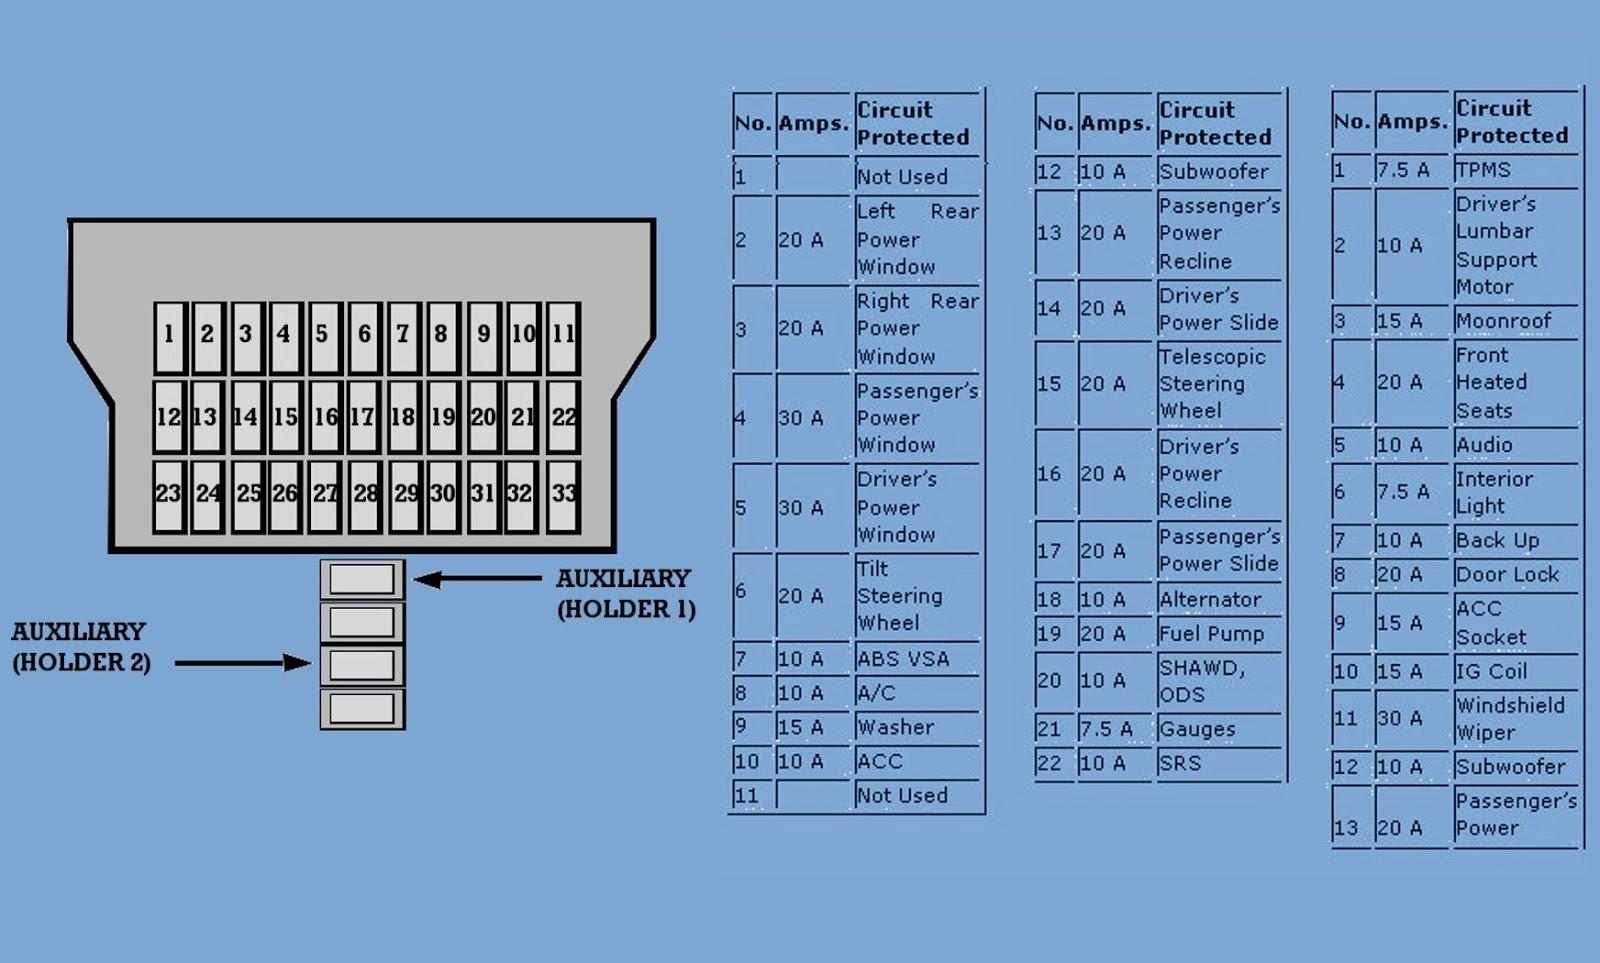 2011 Nissan Juke Fuse Box Diagram | Online Wiring Diagram